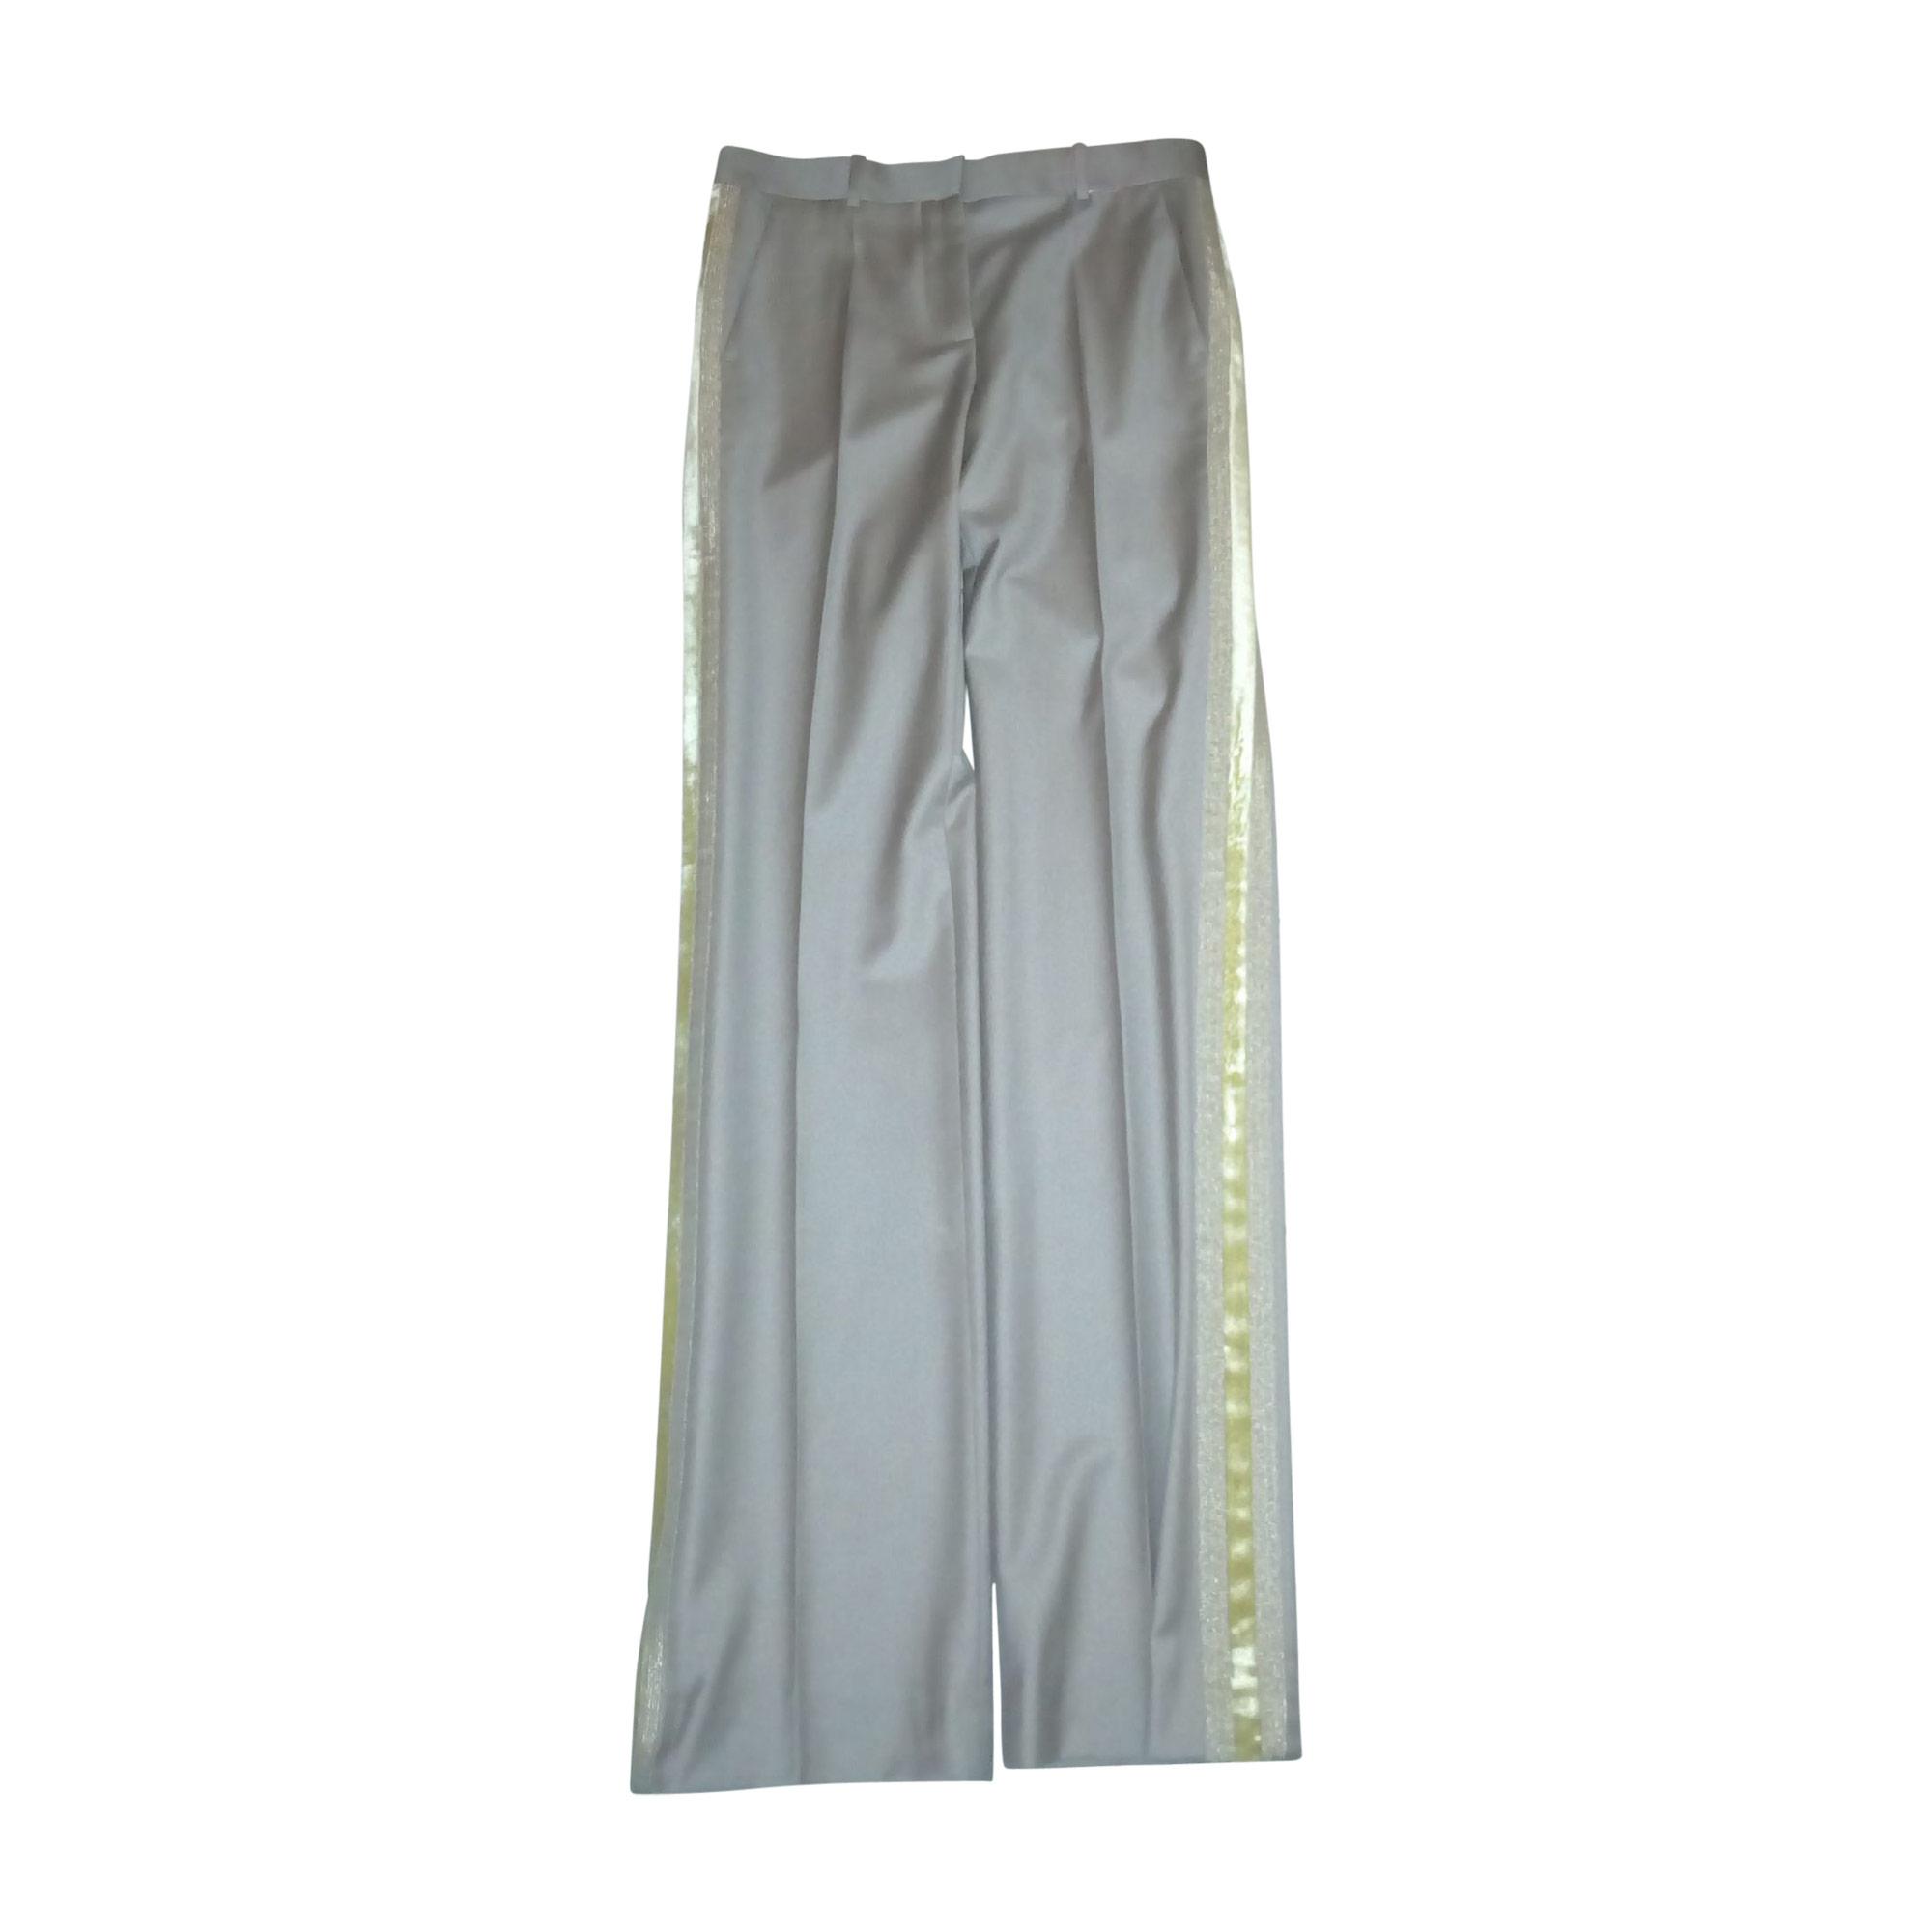 Pantalon droit GIVENCHY Beige, camel